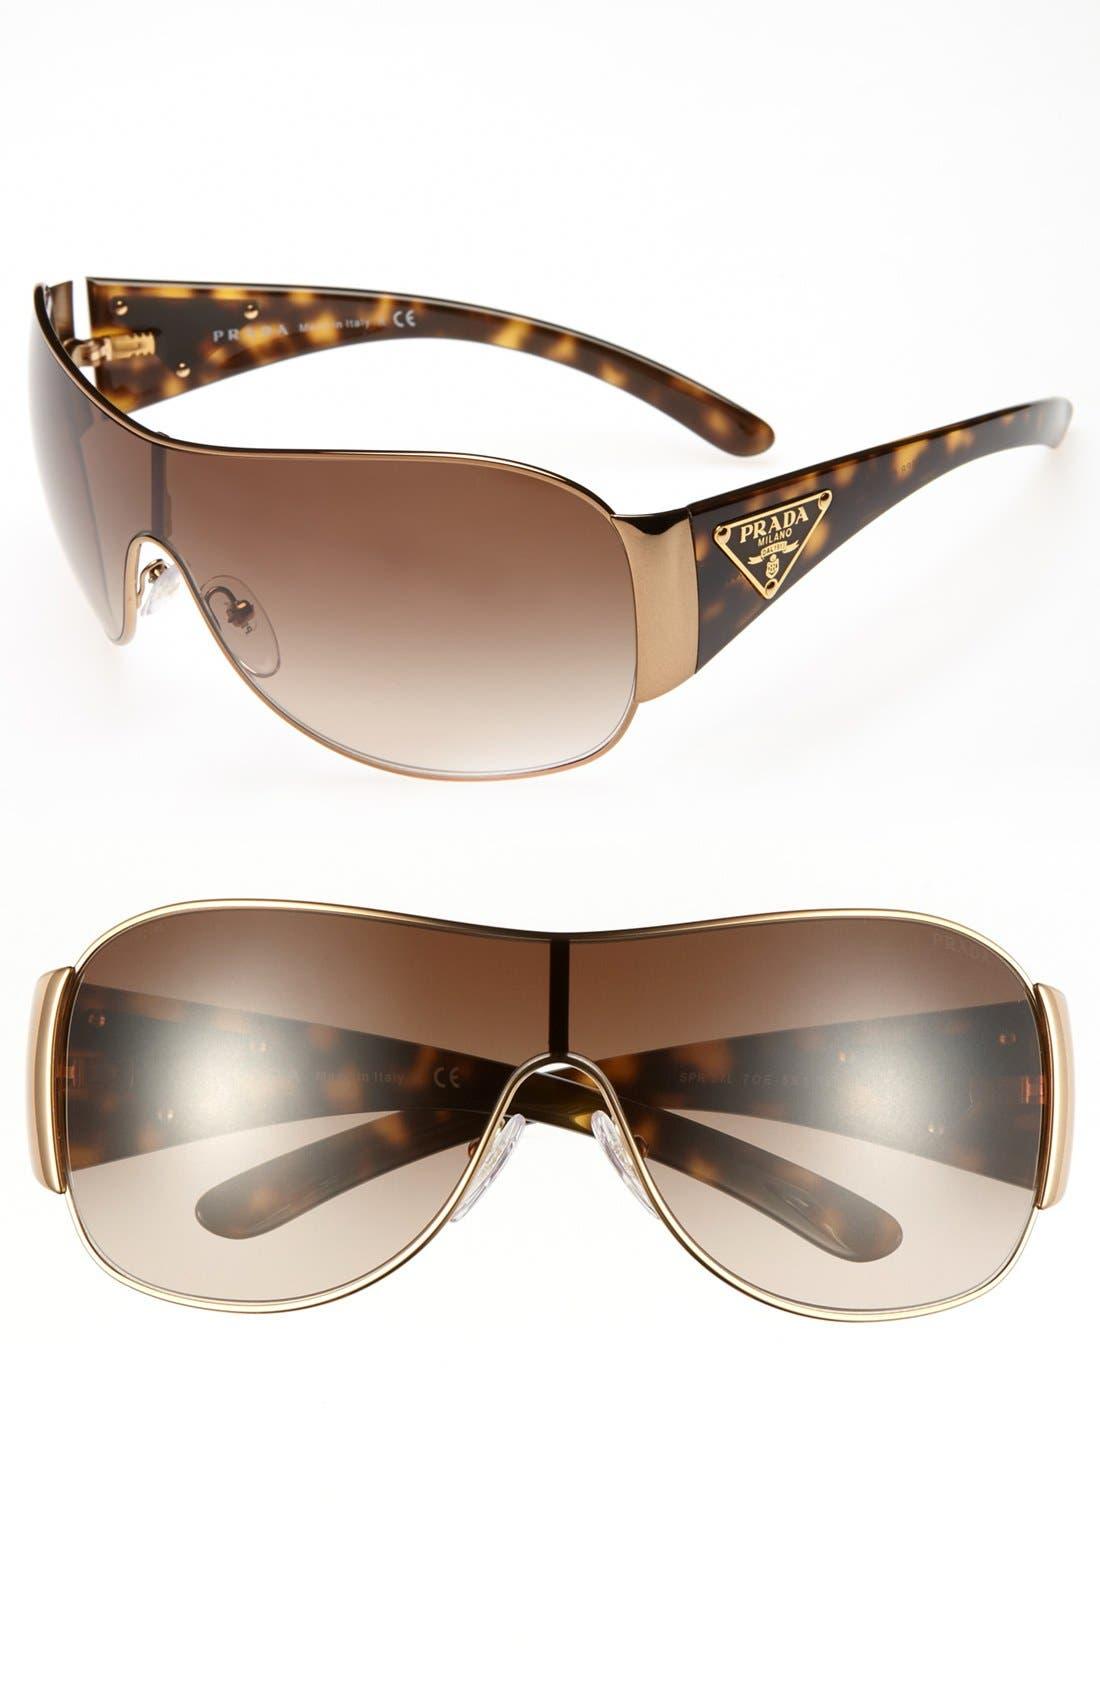 Main Image - Prada 'C-Shield' Polarized Sunglasses